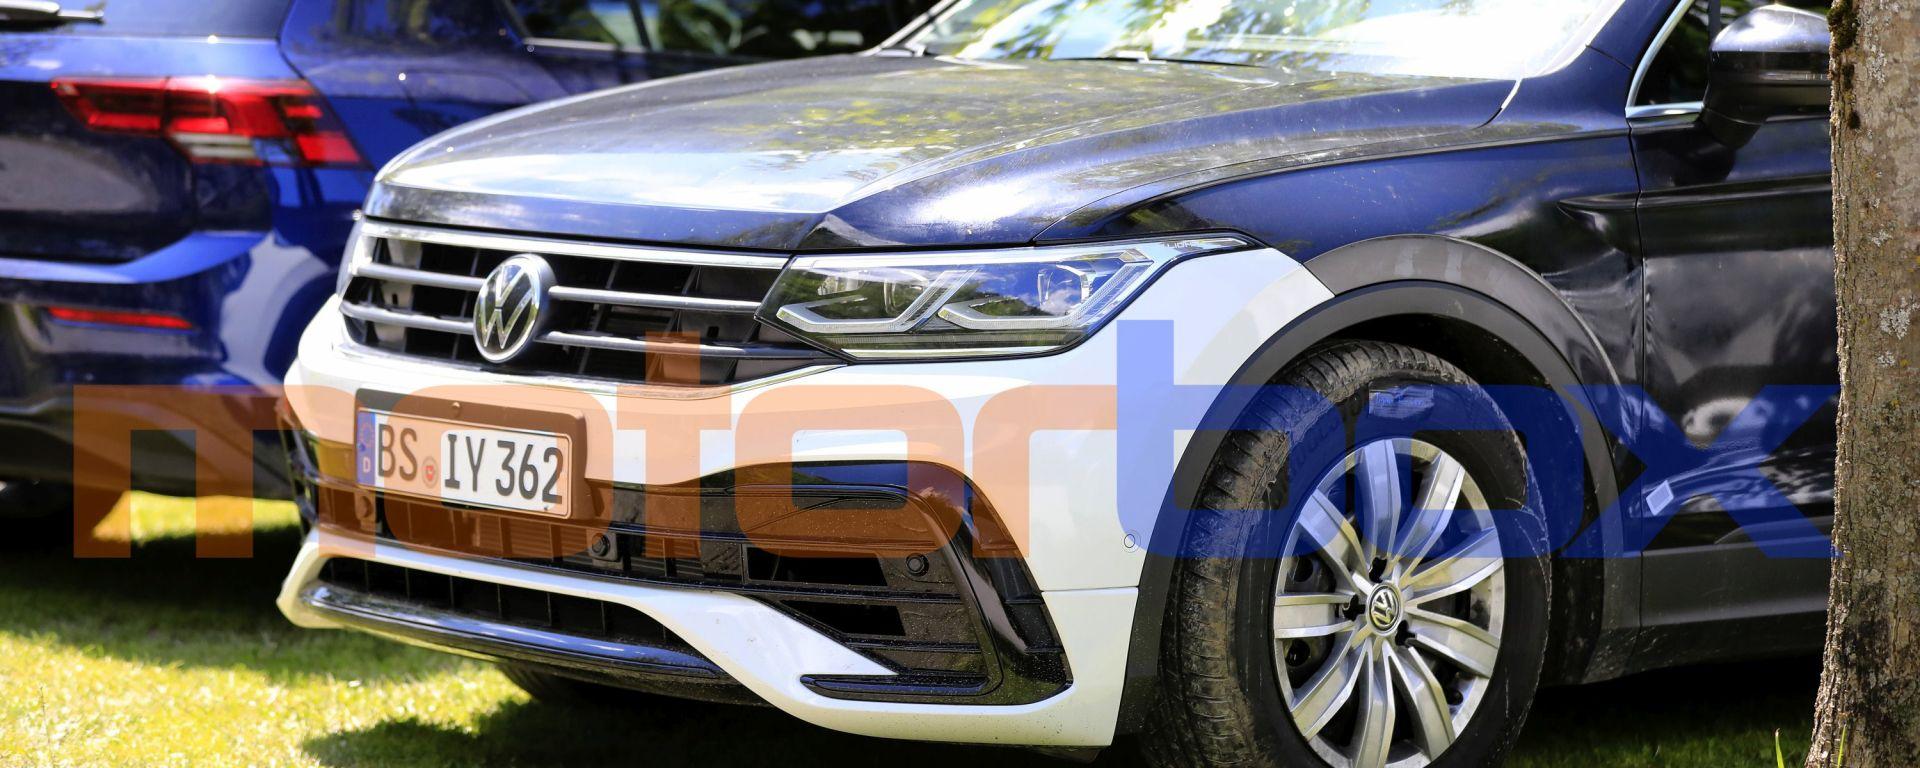 Volkswagen Tiguan 2021: le foto spia